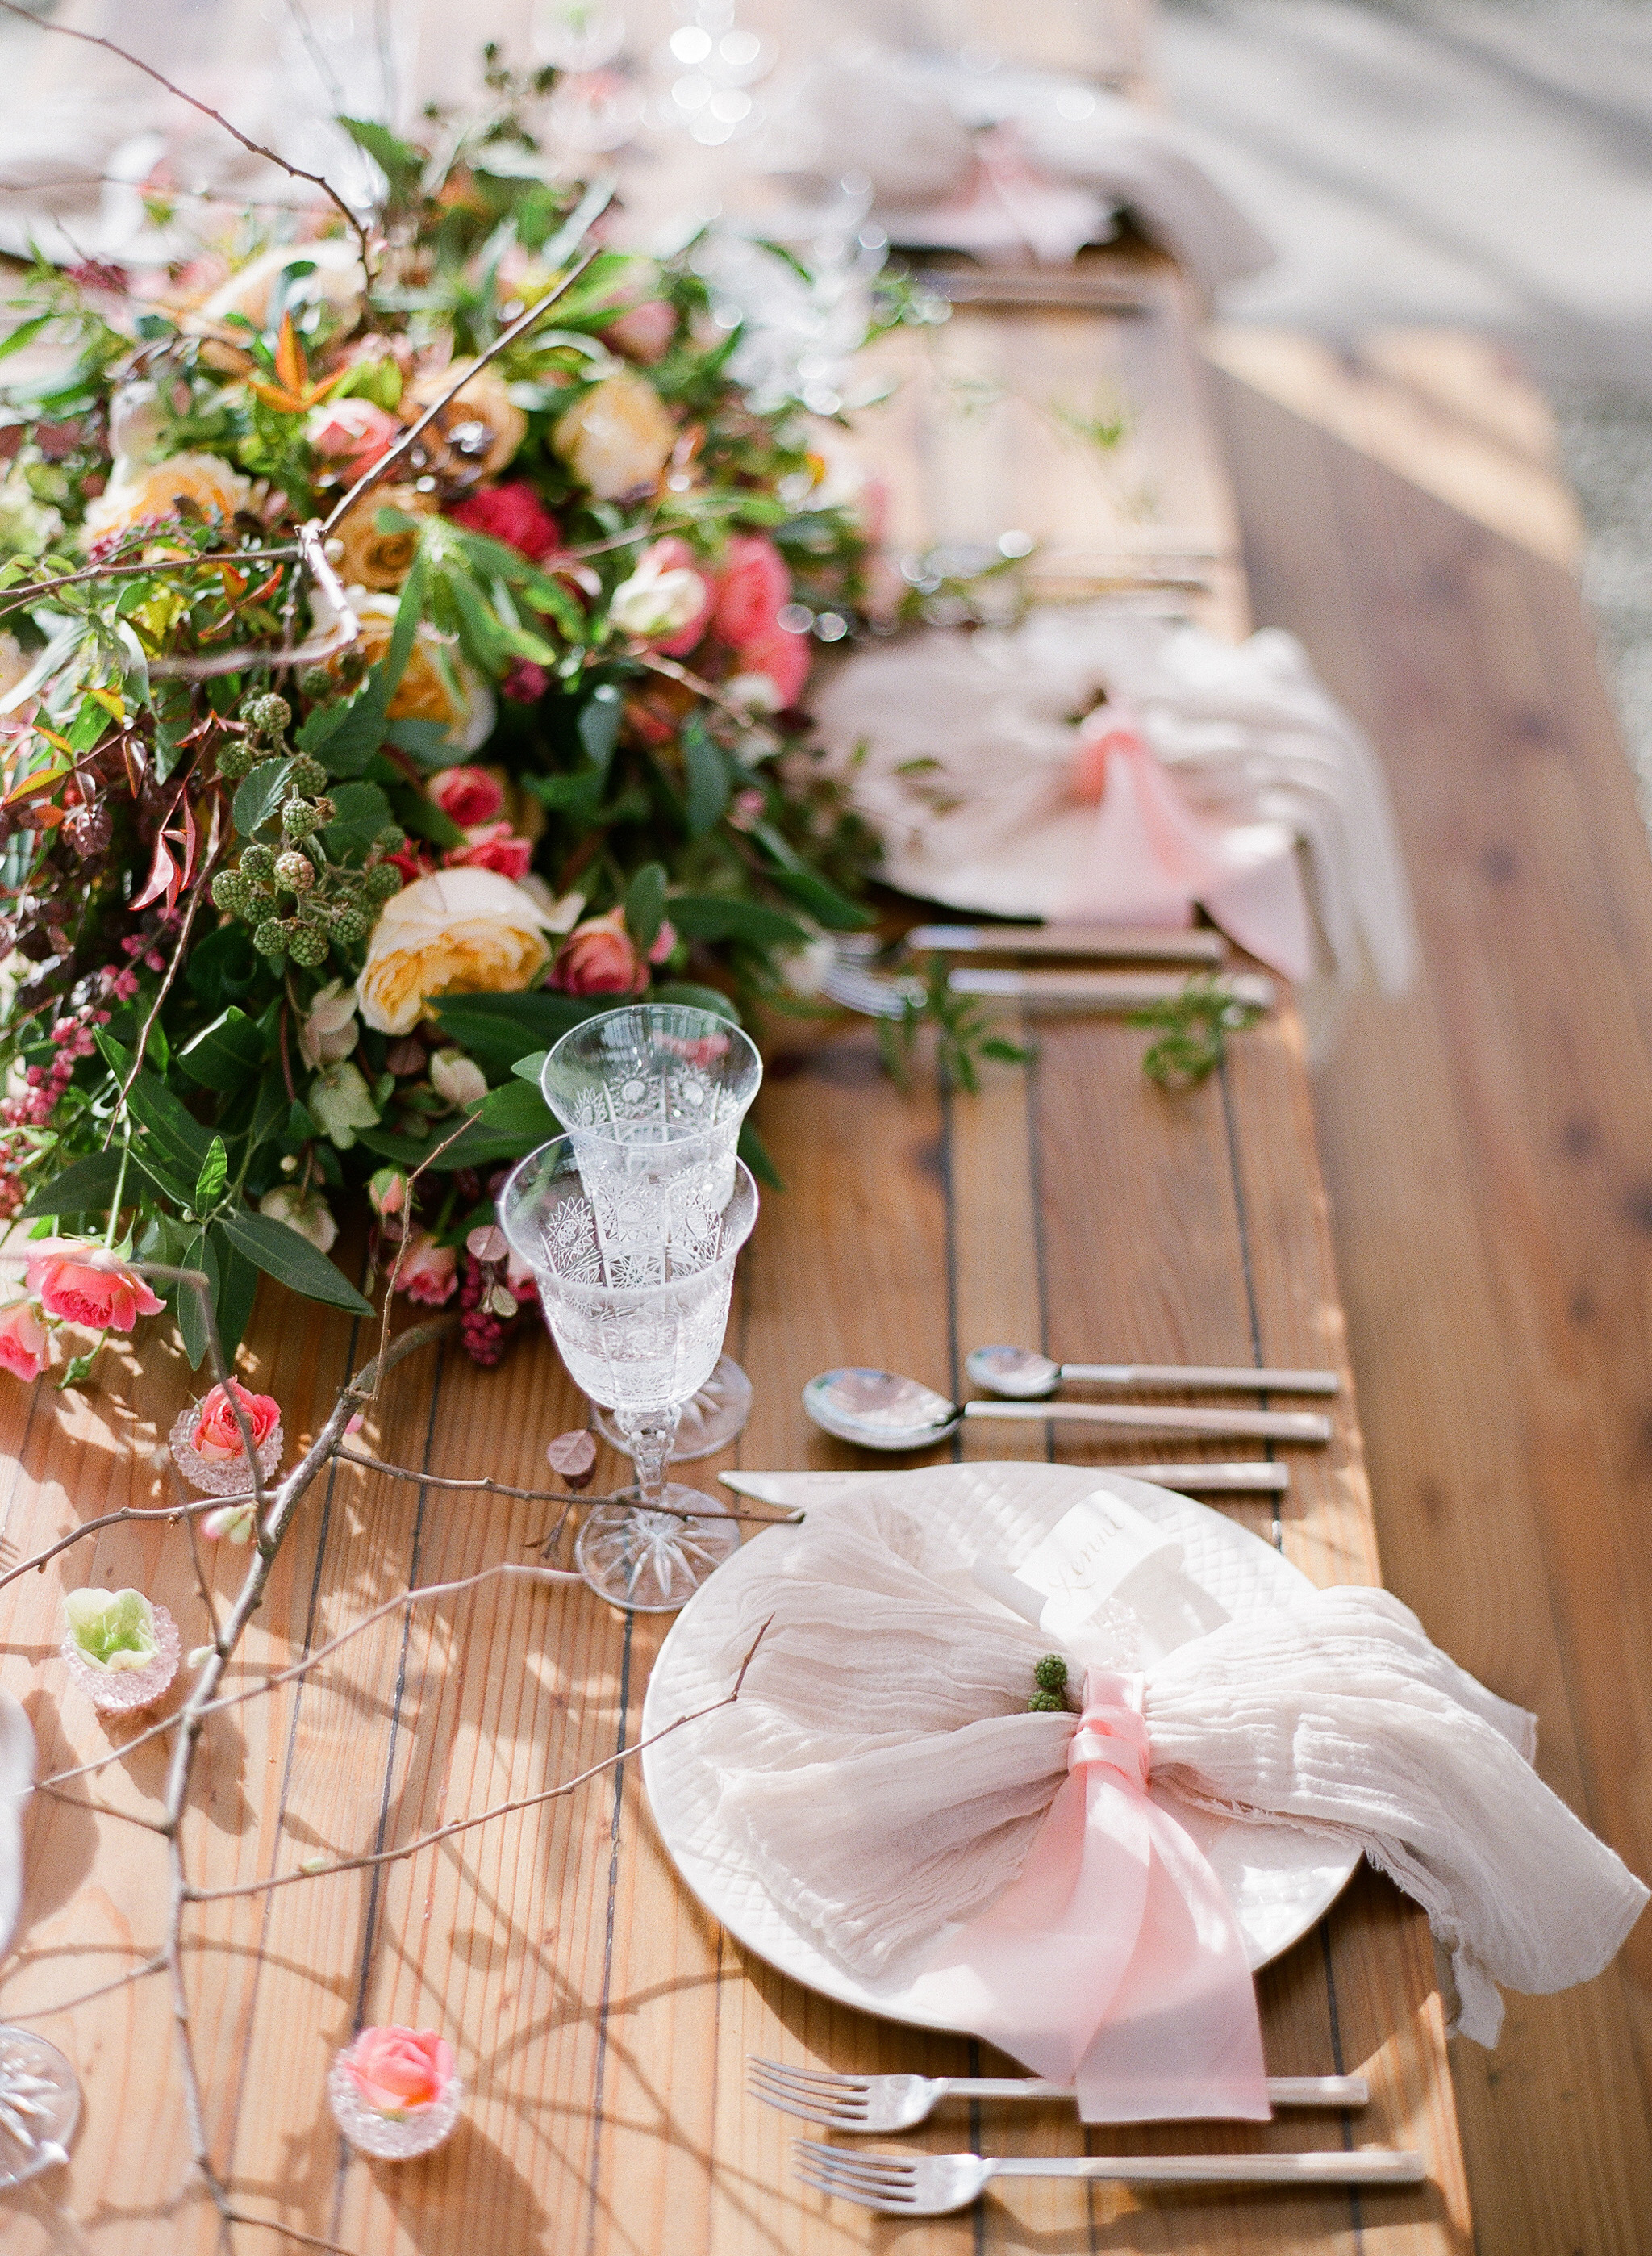 www.santabarbarawedding.com | Megan Sorel Photography | Dos Pueblos Orchid Farm | Table Setting